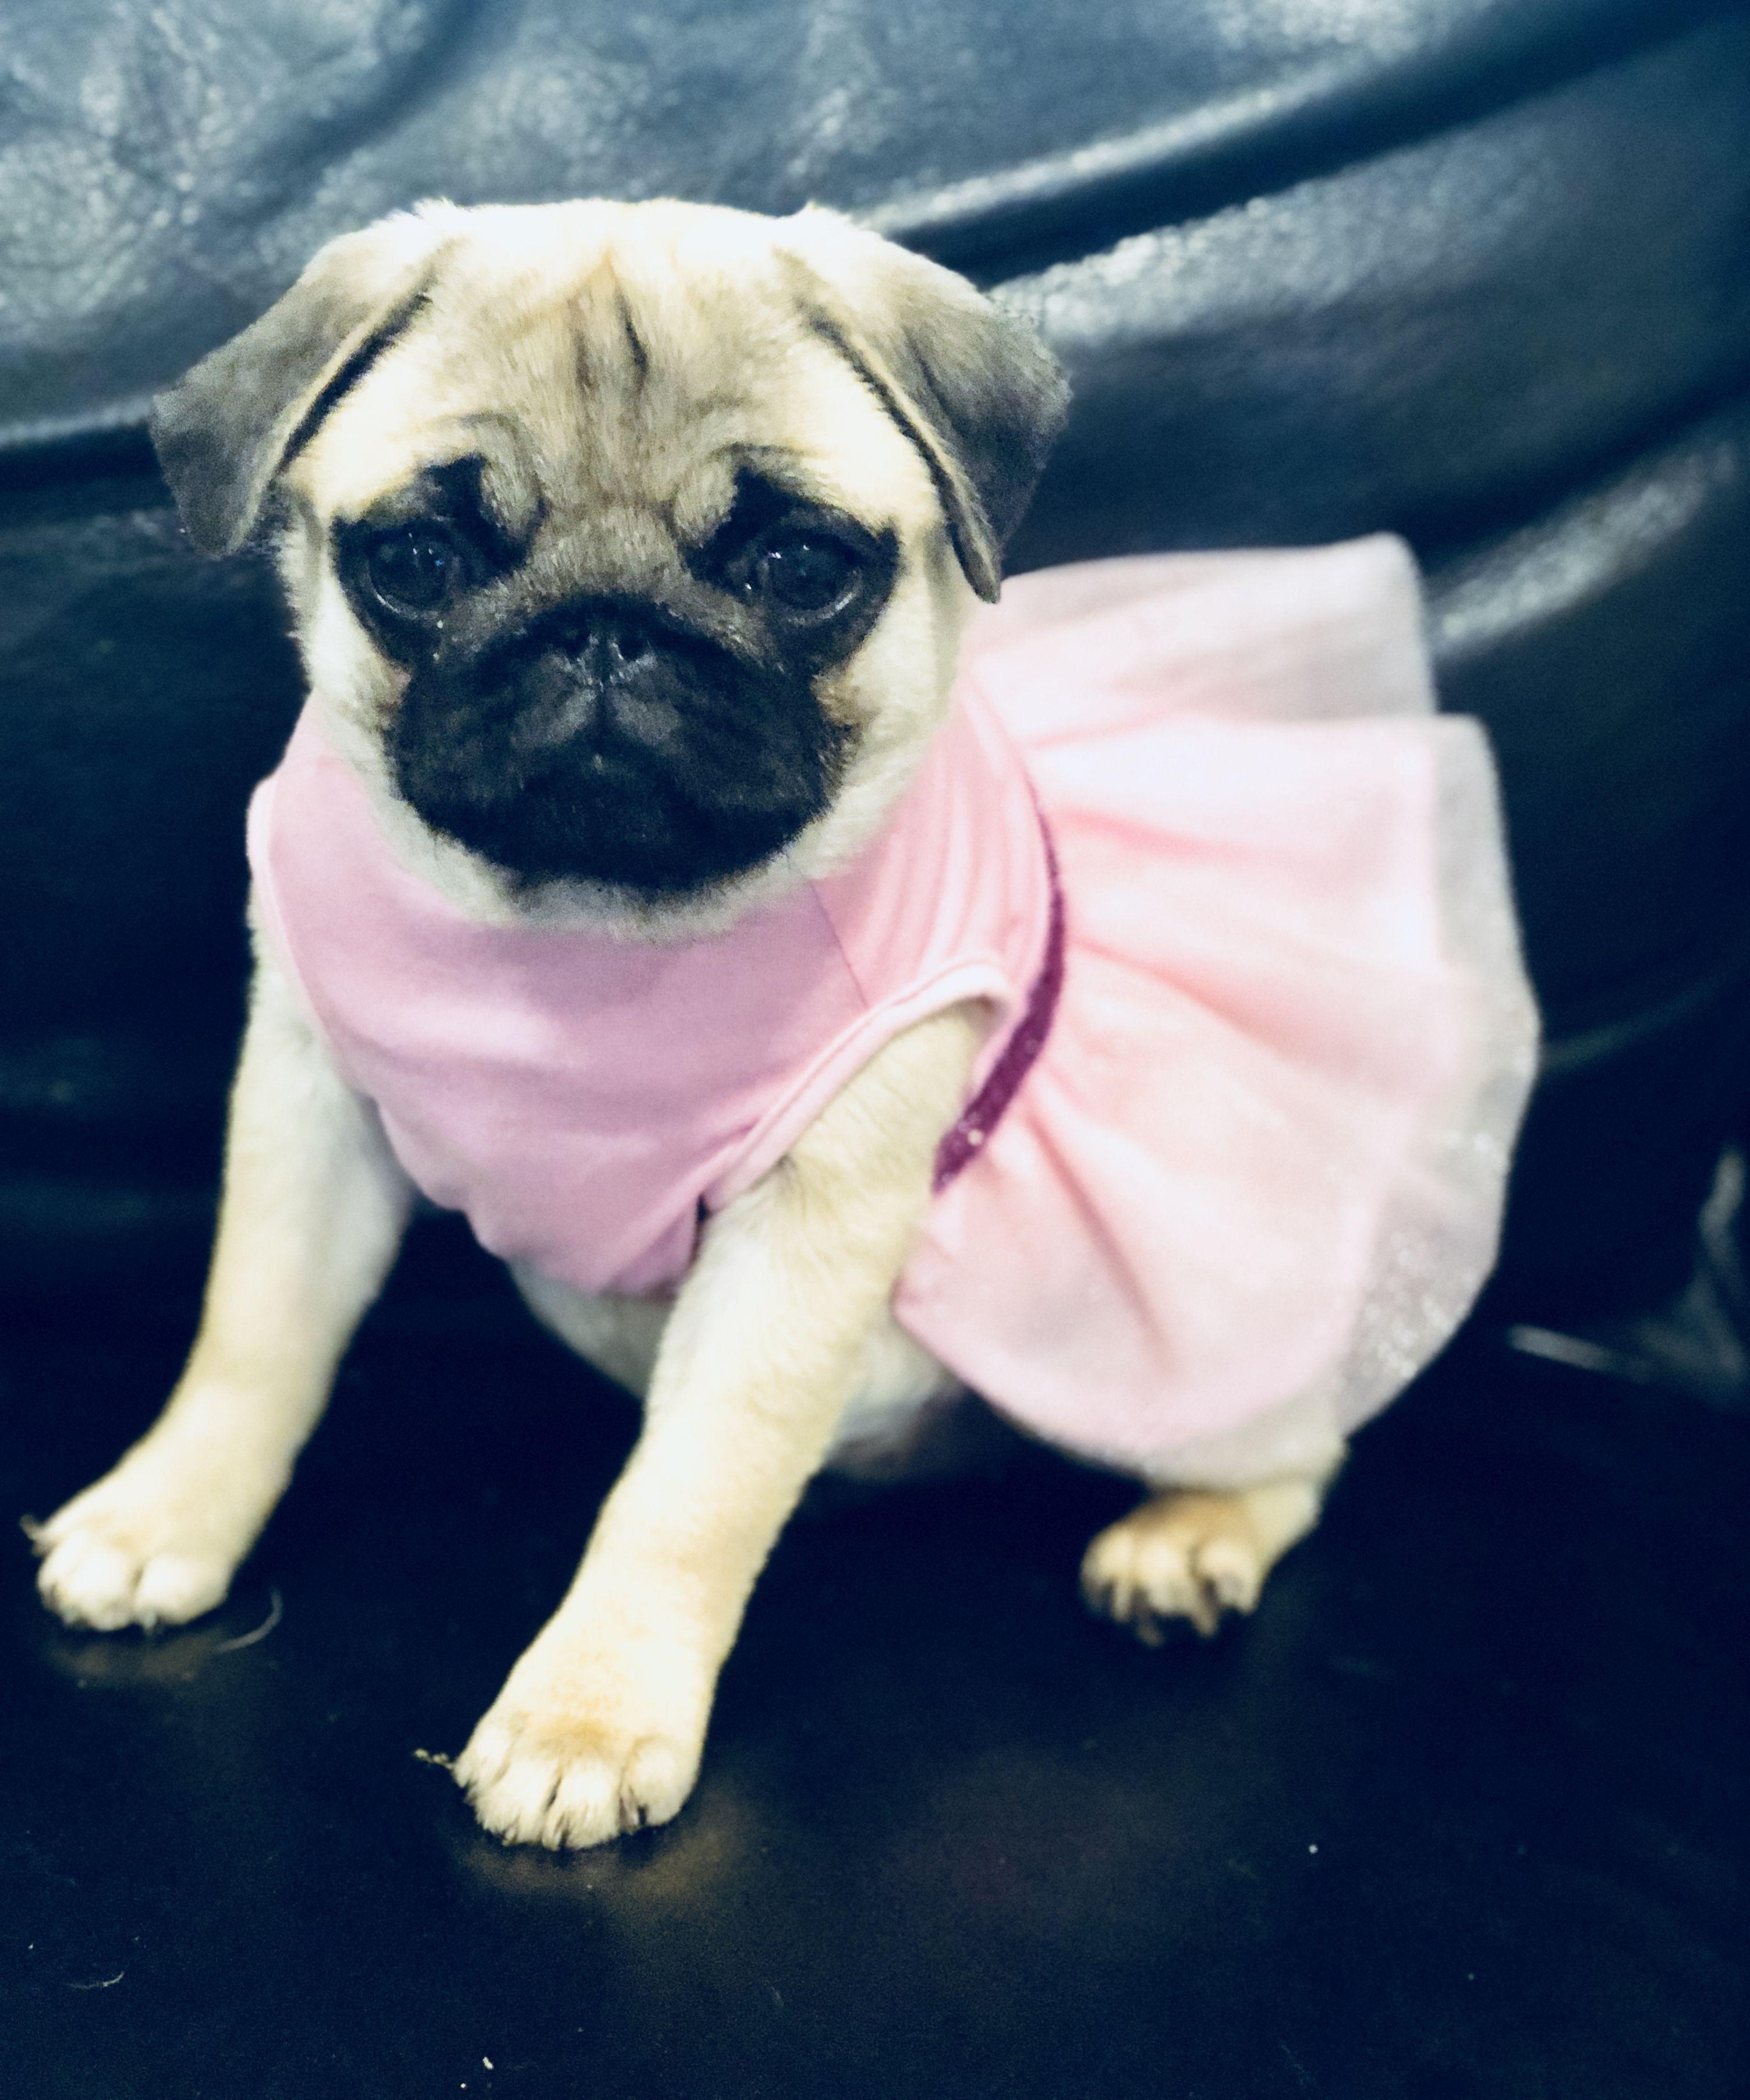 Dog In A Dress Violet The Pug My Pug Pug Puglife Pugpuppies